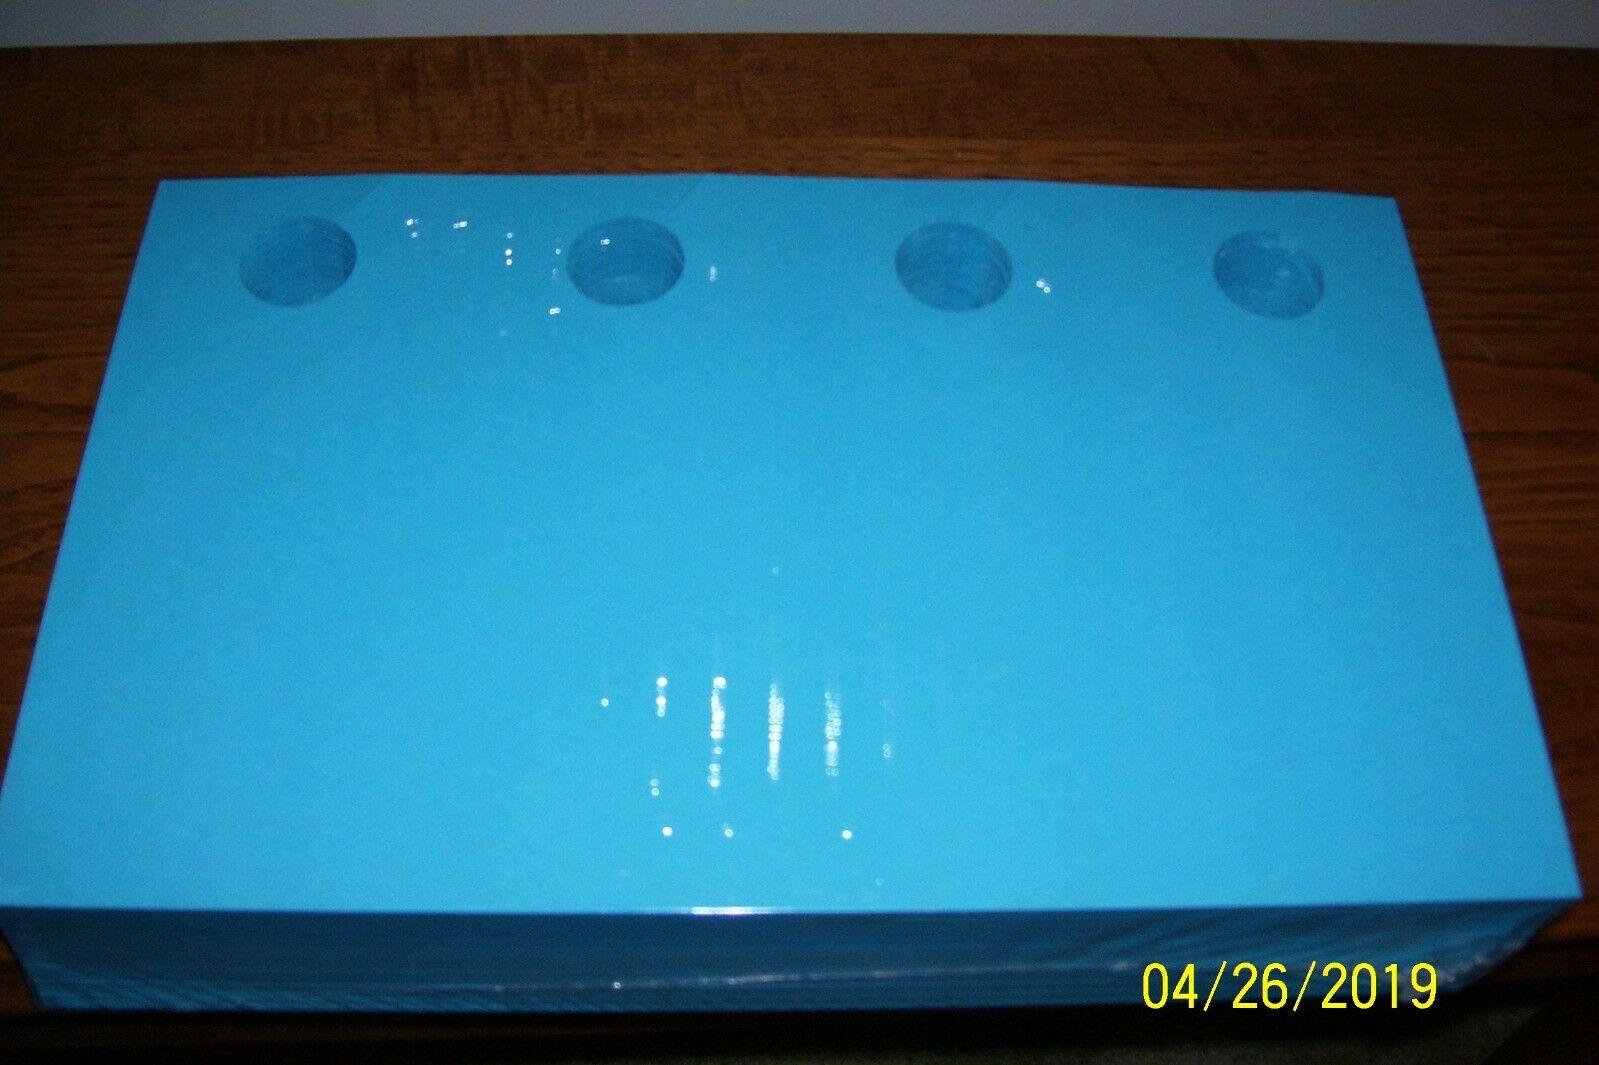 Blanks USA LEGAL size 4-up Door Hanger with holes 1000 Hangers per pkg bluee